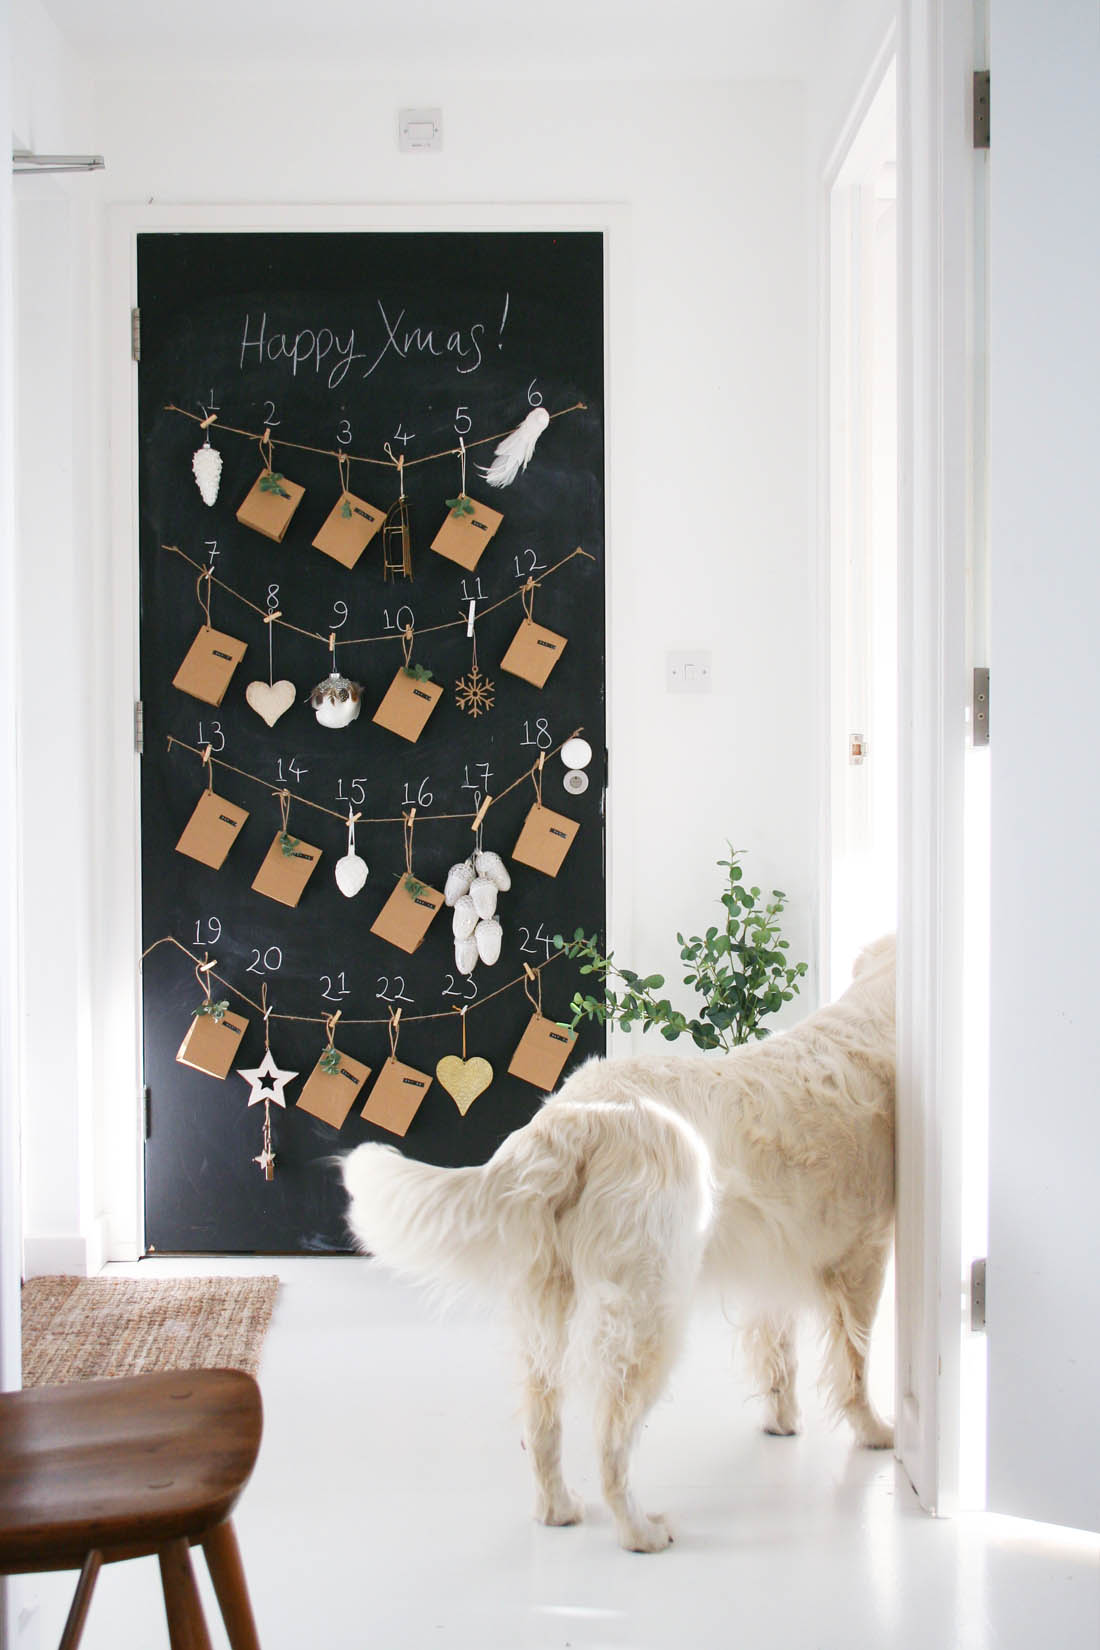 Декор однокомнатной квартиры новогодним календарем